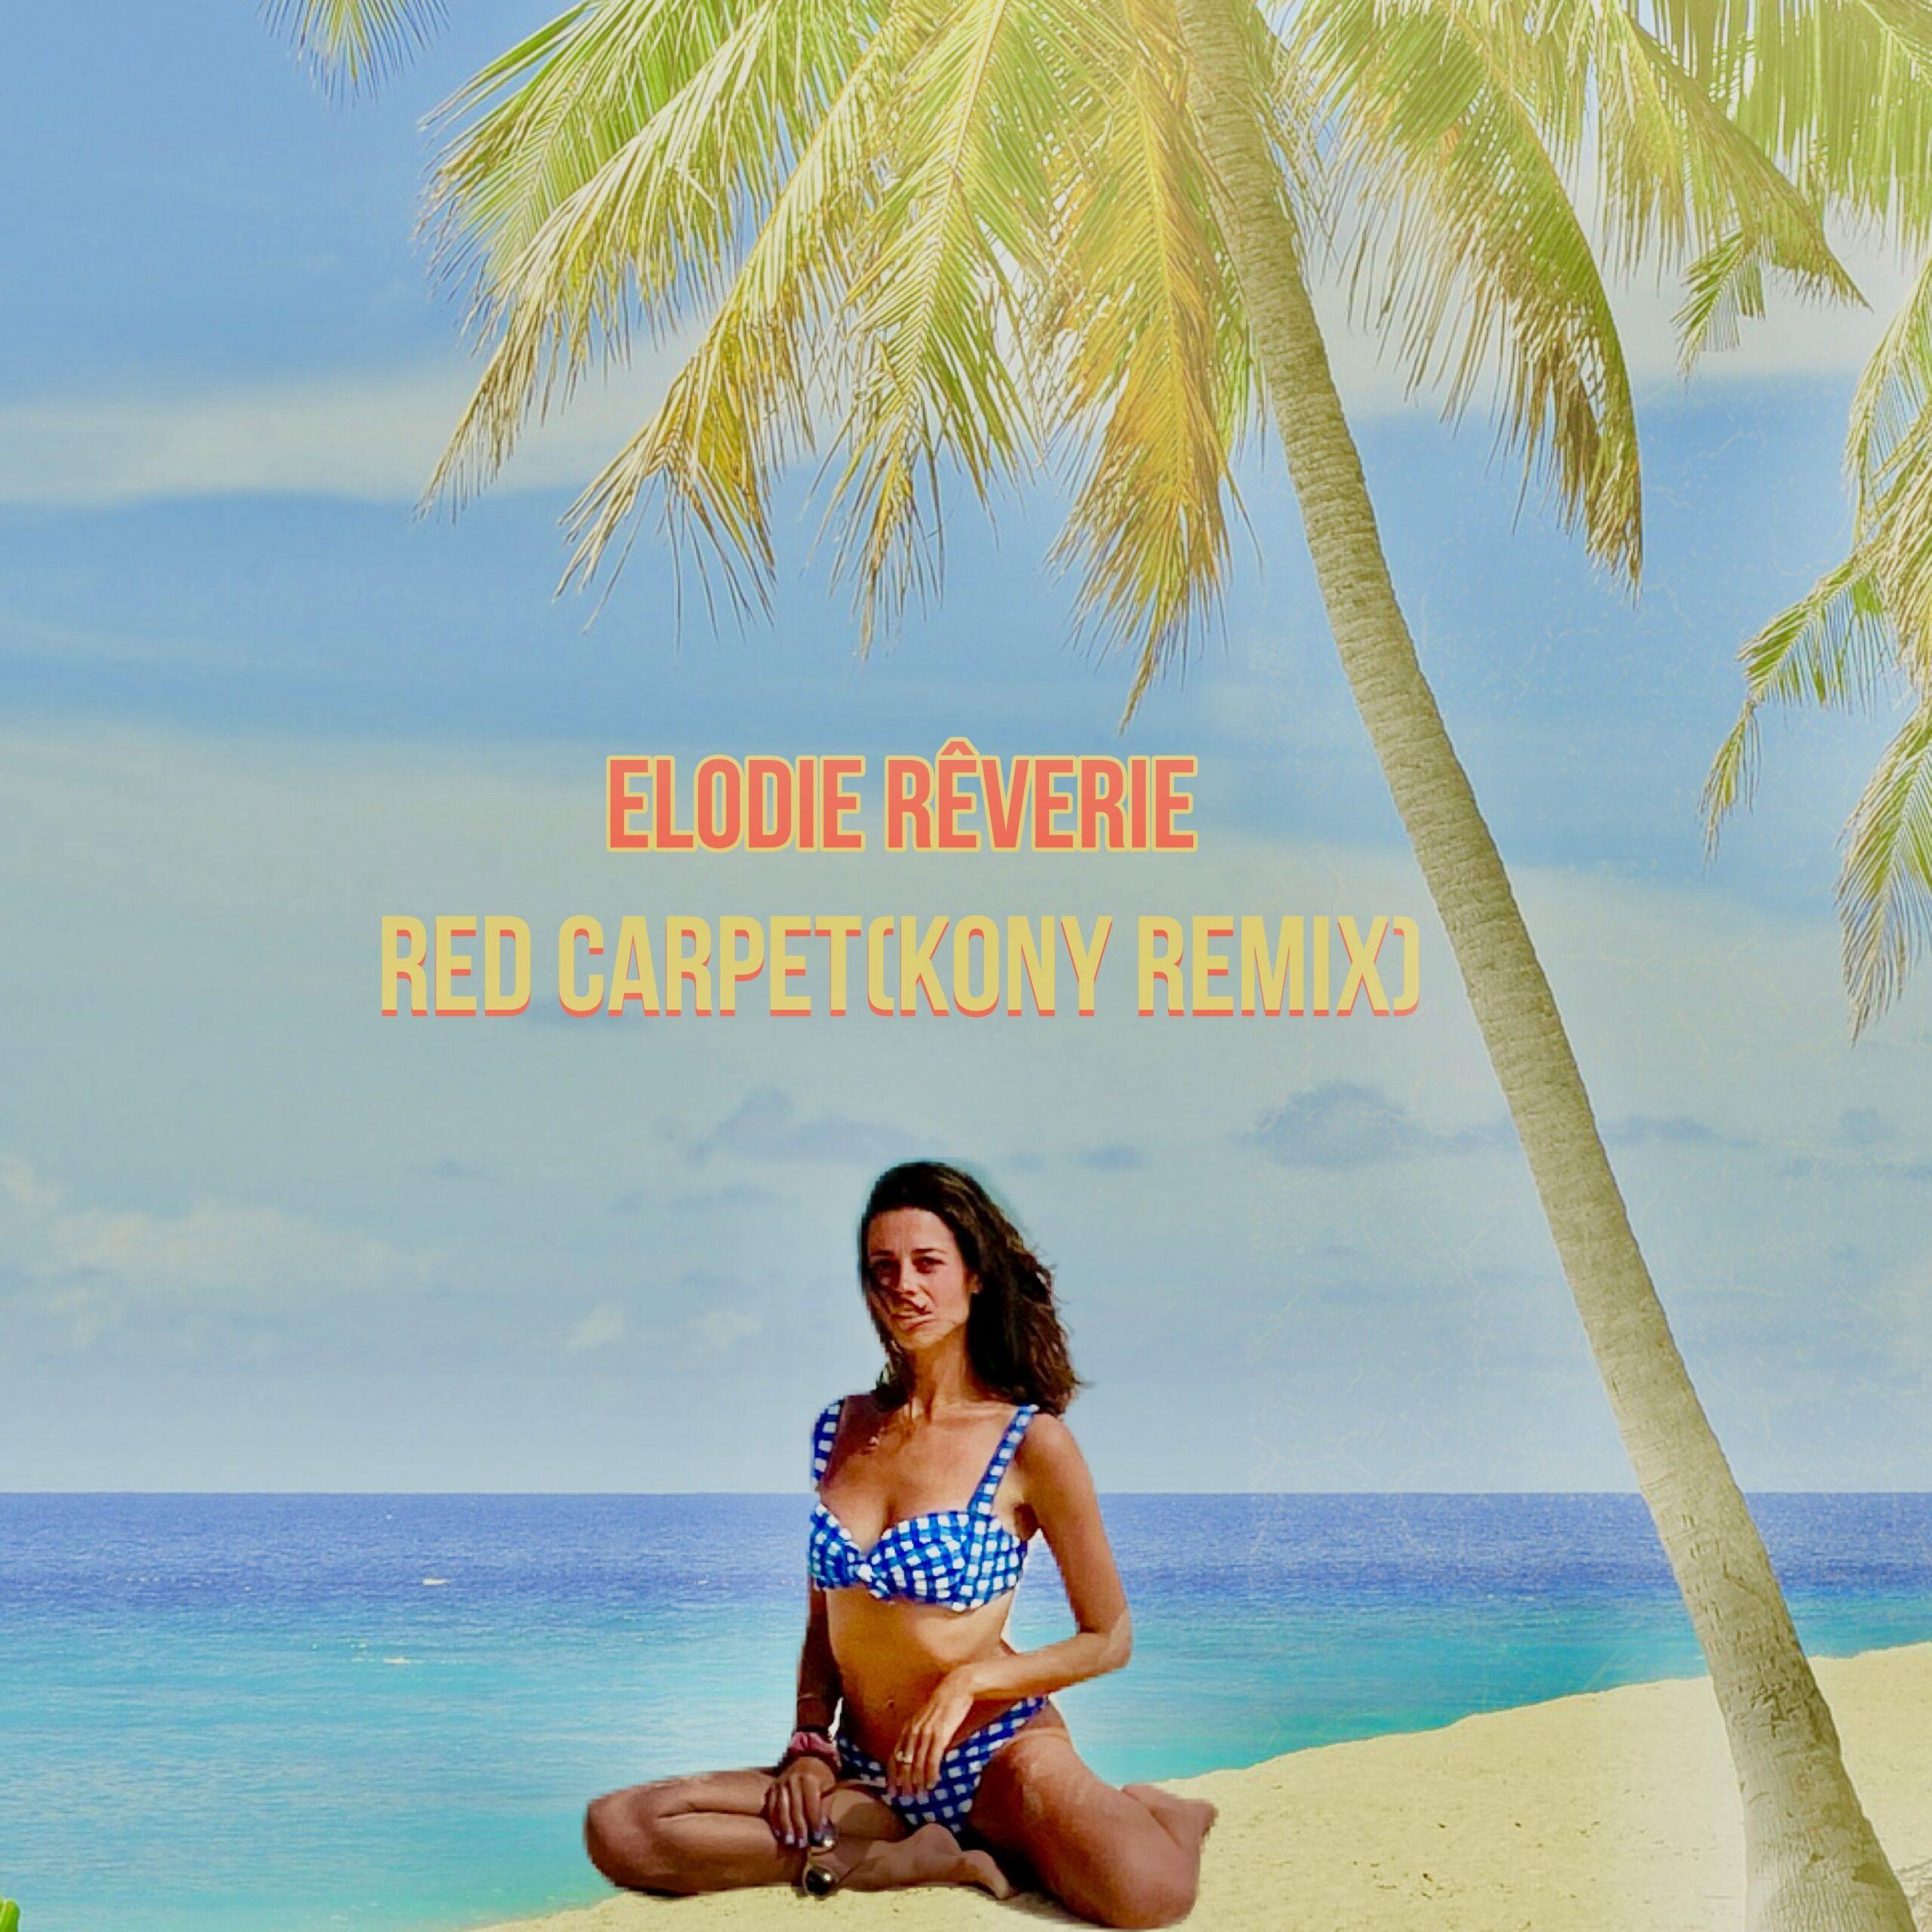 Elodie Rêverie.- Red Carpet (Kony Remix)